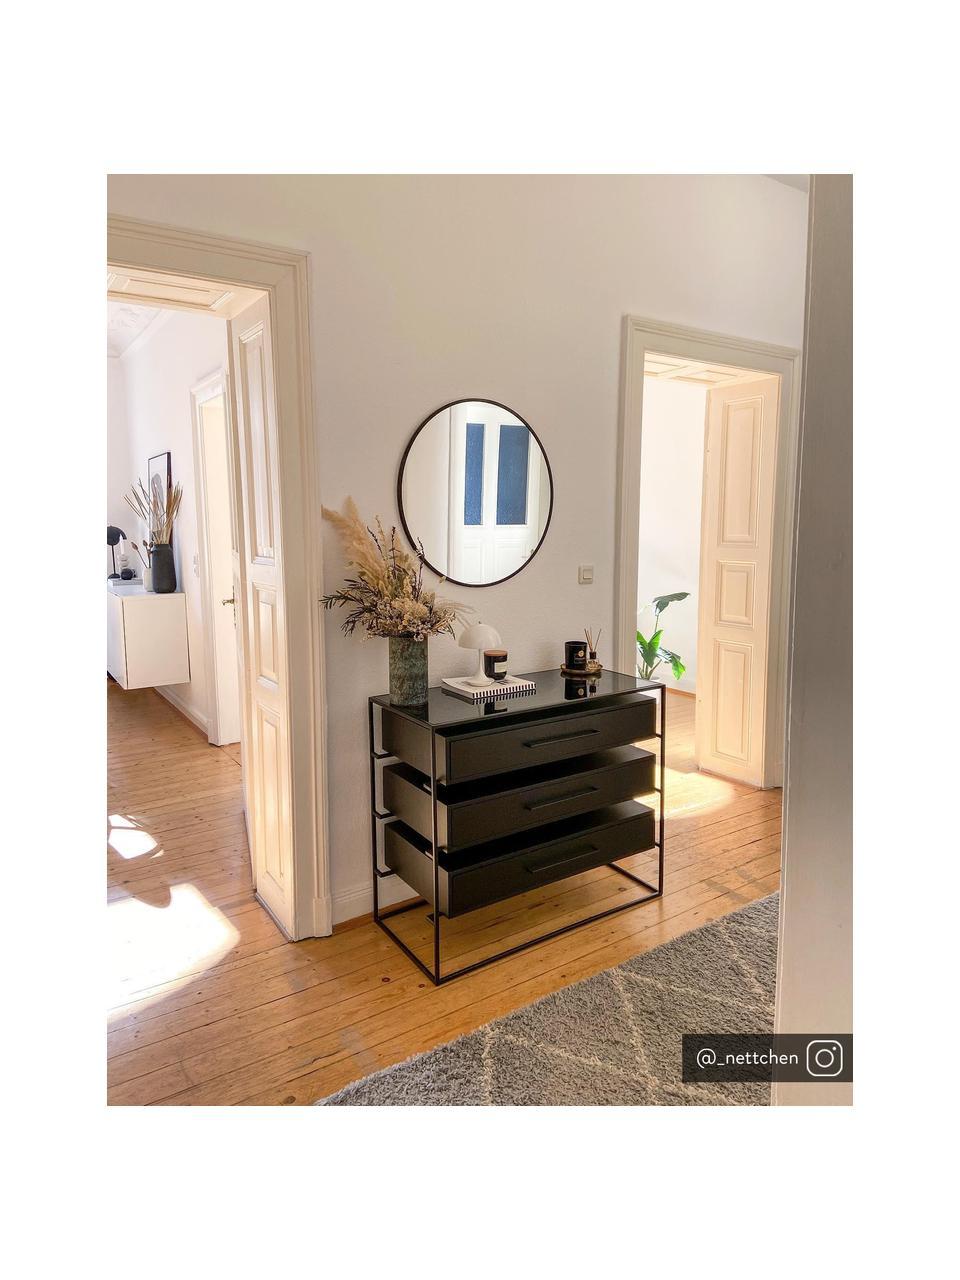 Ladekast Lyle met glazen blad, Plank: glas, Laden: zwart gelakt mangohout. Frame en handvat: mat zwart, 100 x 82 cm